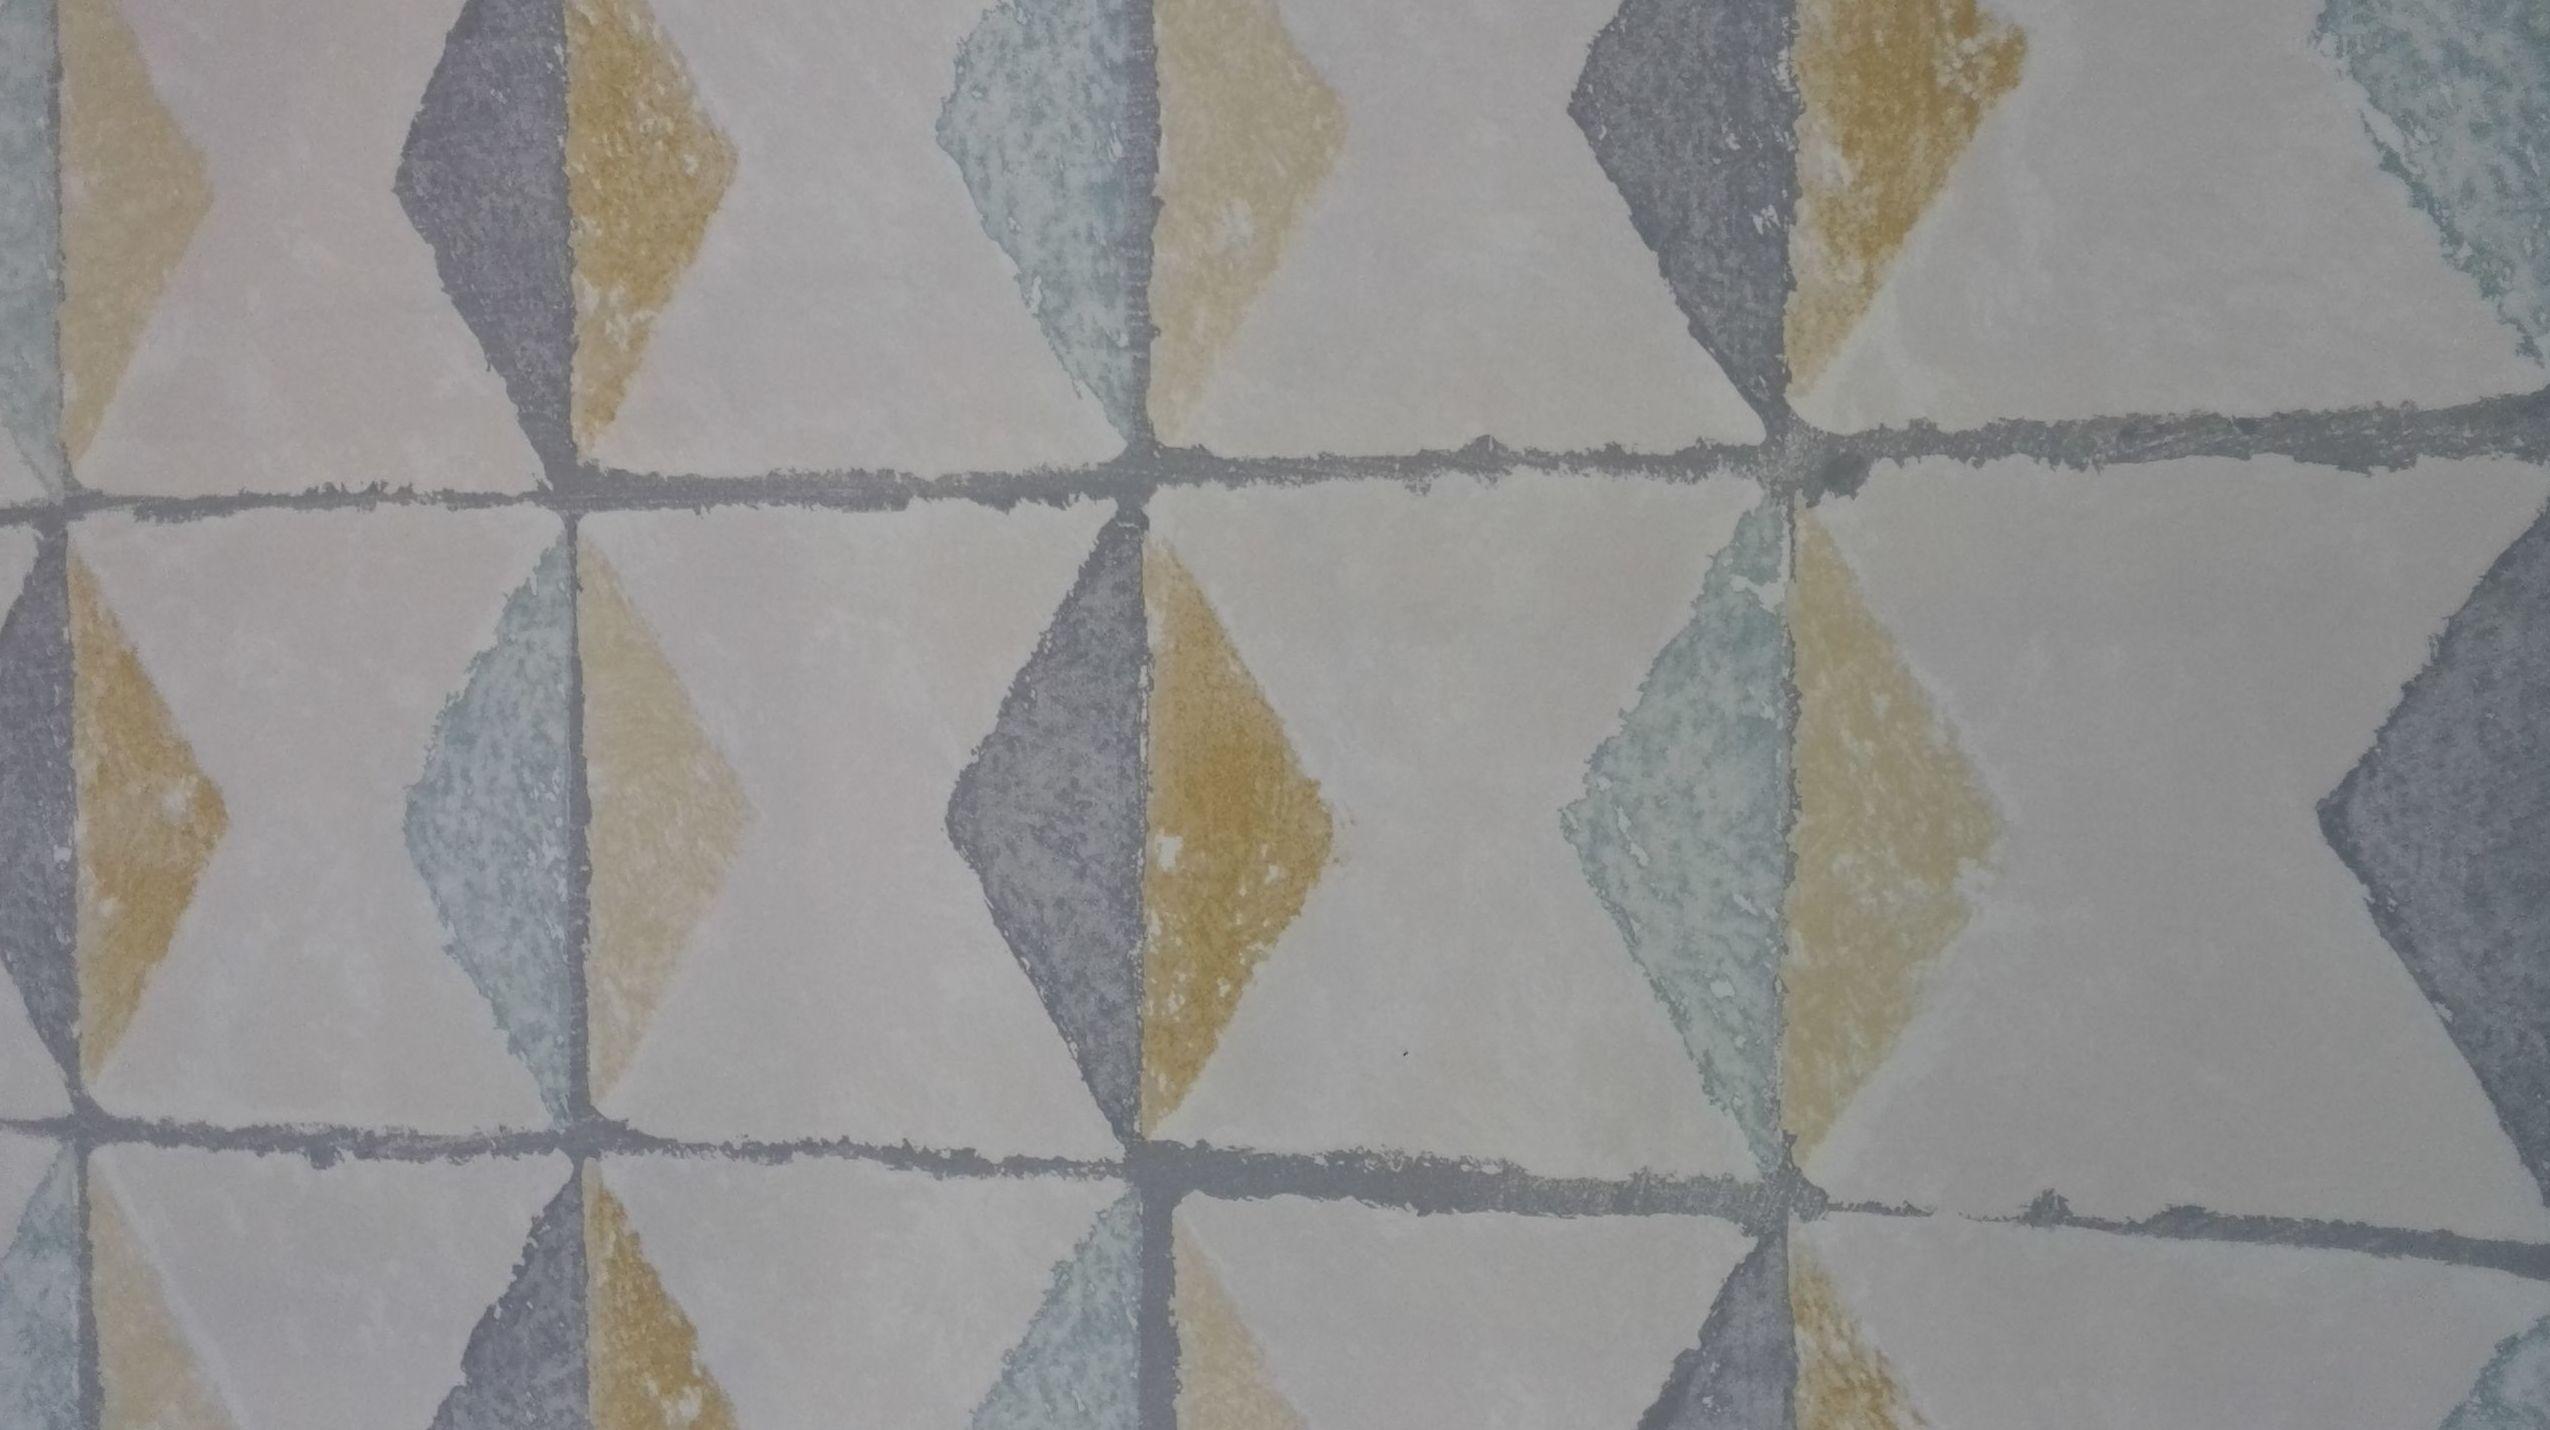 Foto 24 de Decoración textil en Madrid | Diseño Textil